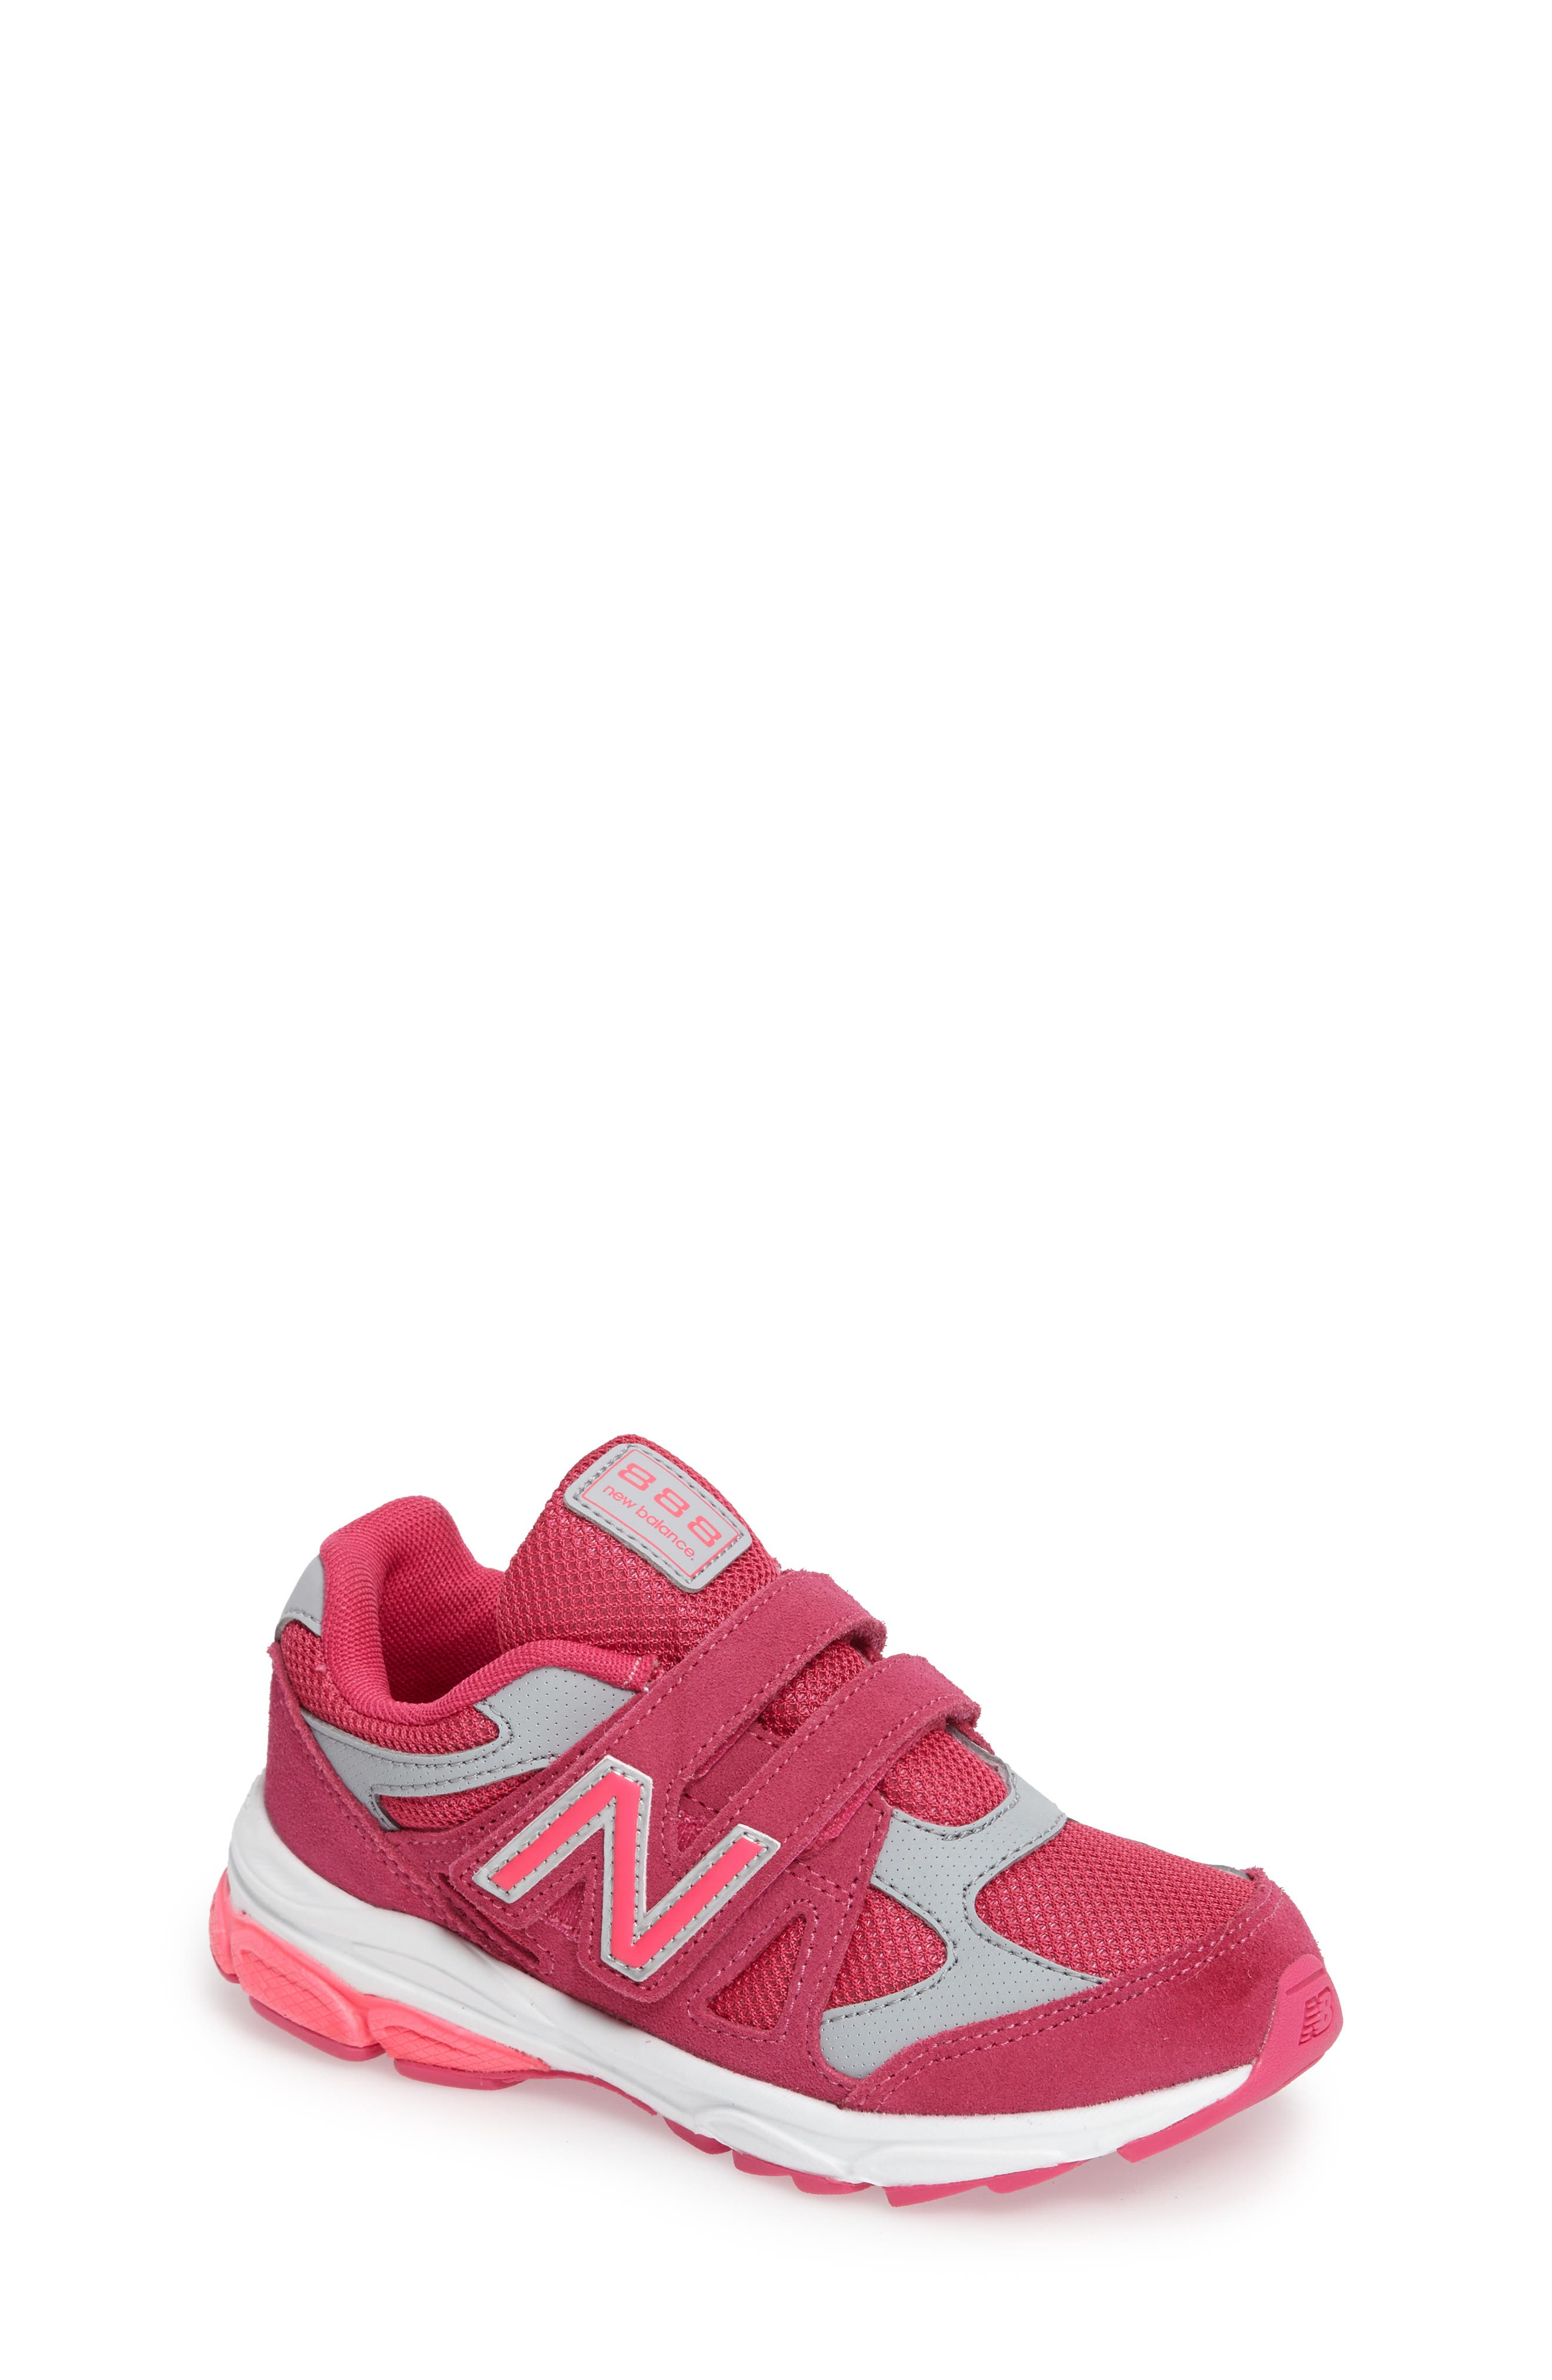 Main Image - New Balance 888 Sneaker (Baby, Walker, Toddler & Little Kid)